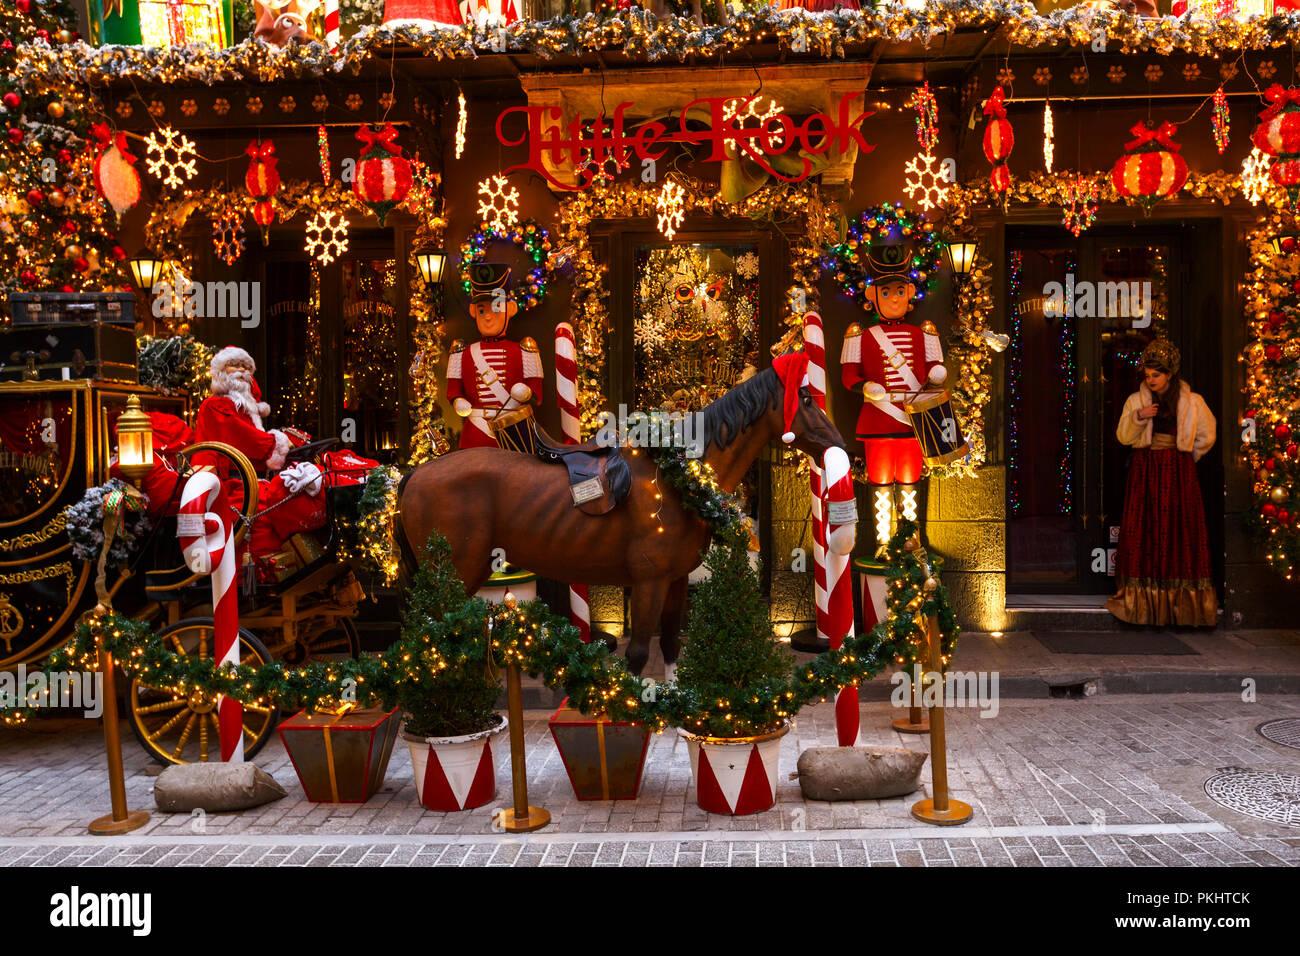 Greece Psiri Stockfotos & Greece Psiri Bilder - Alamy